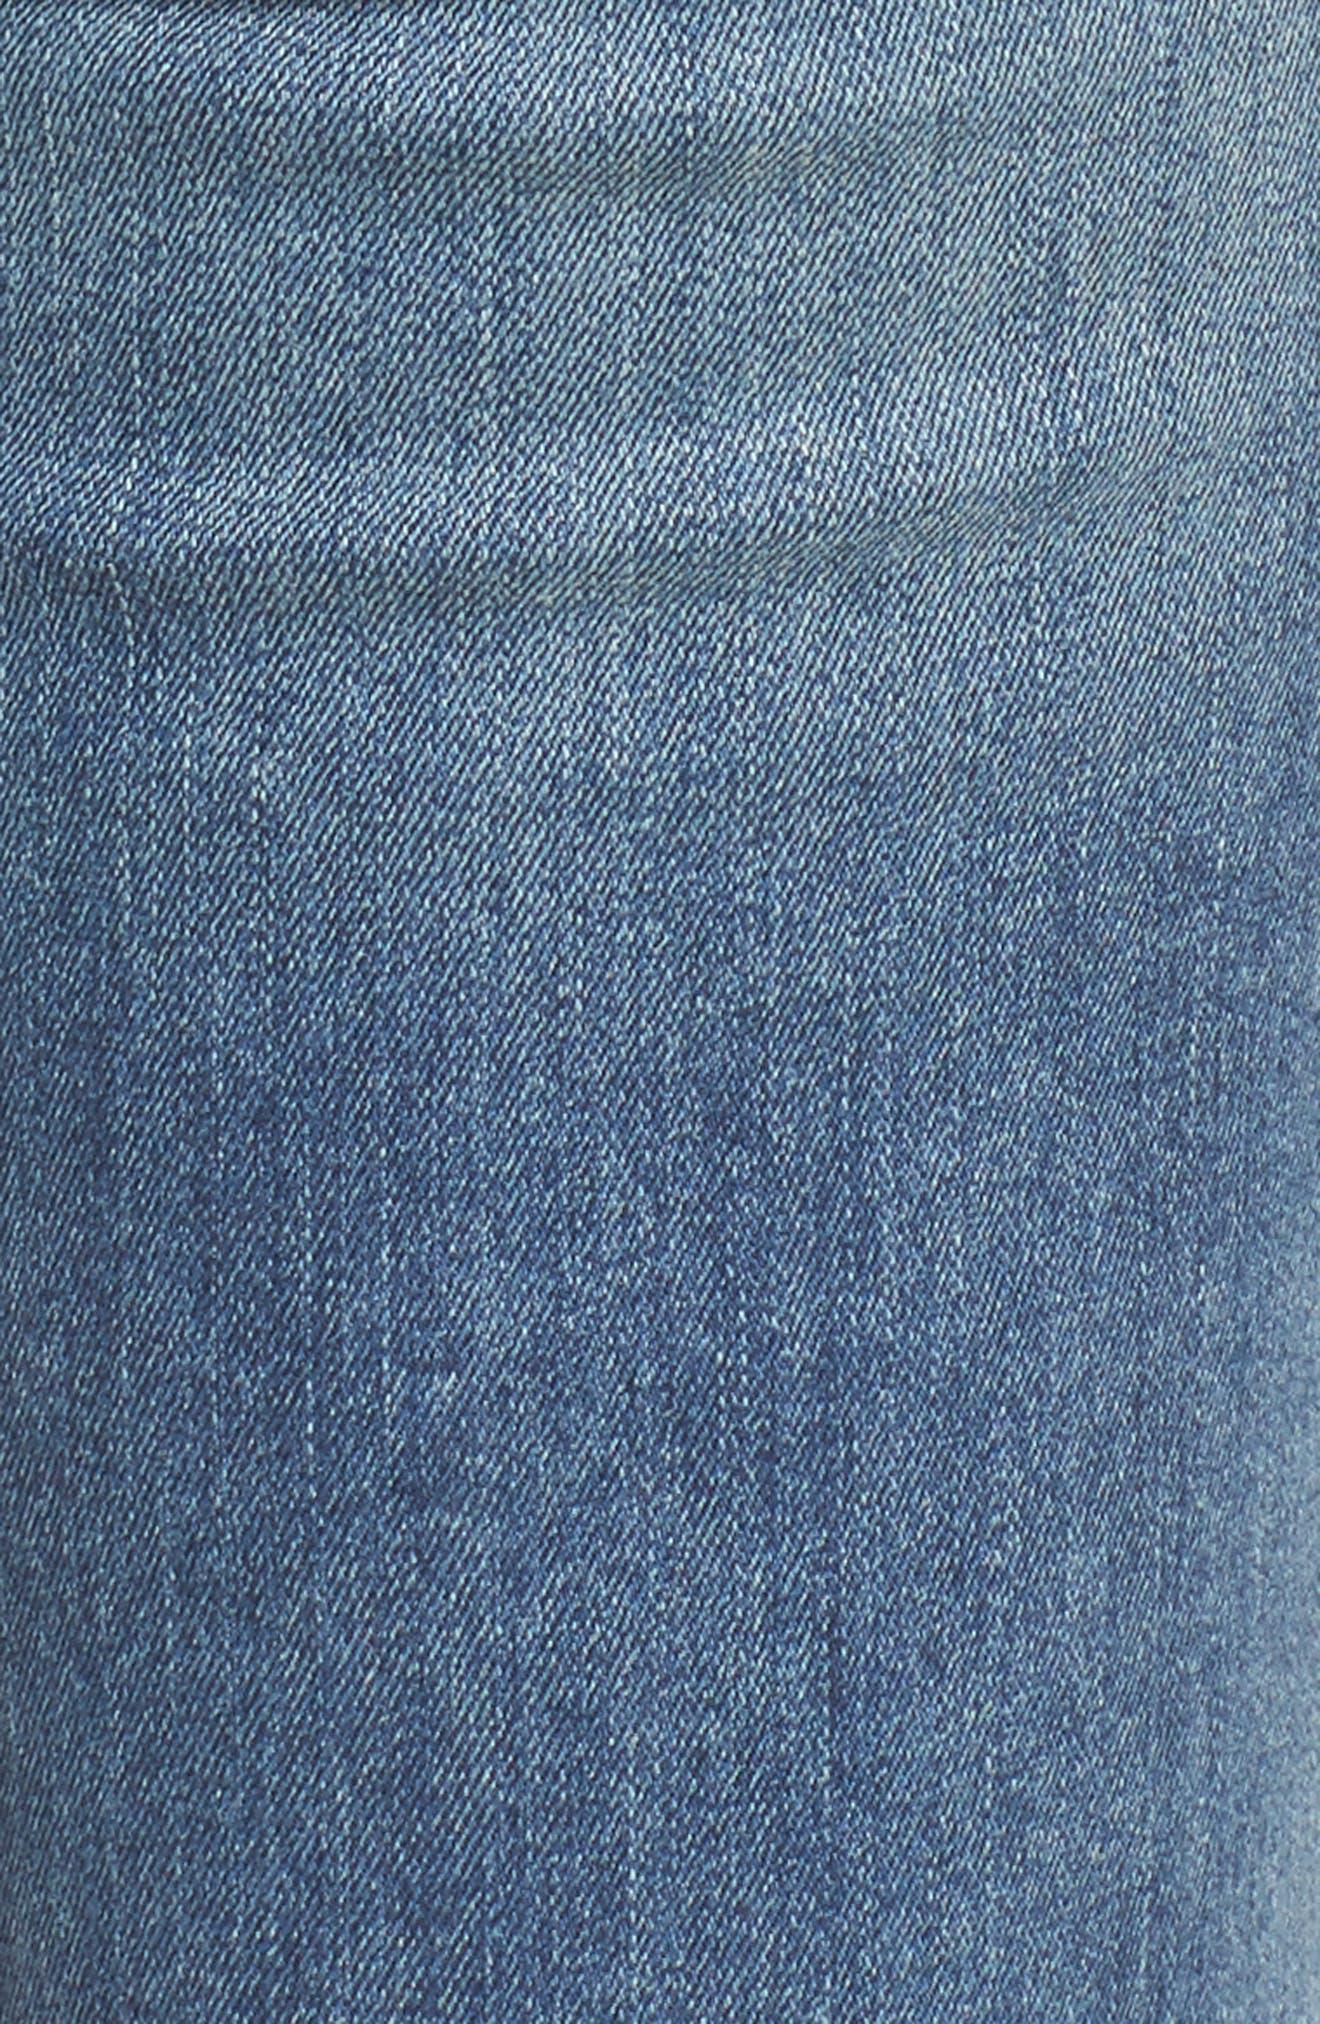 Ava Stretch Skinny Jeans,                             Alternate thumbnail 10, color,